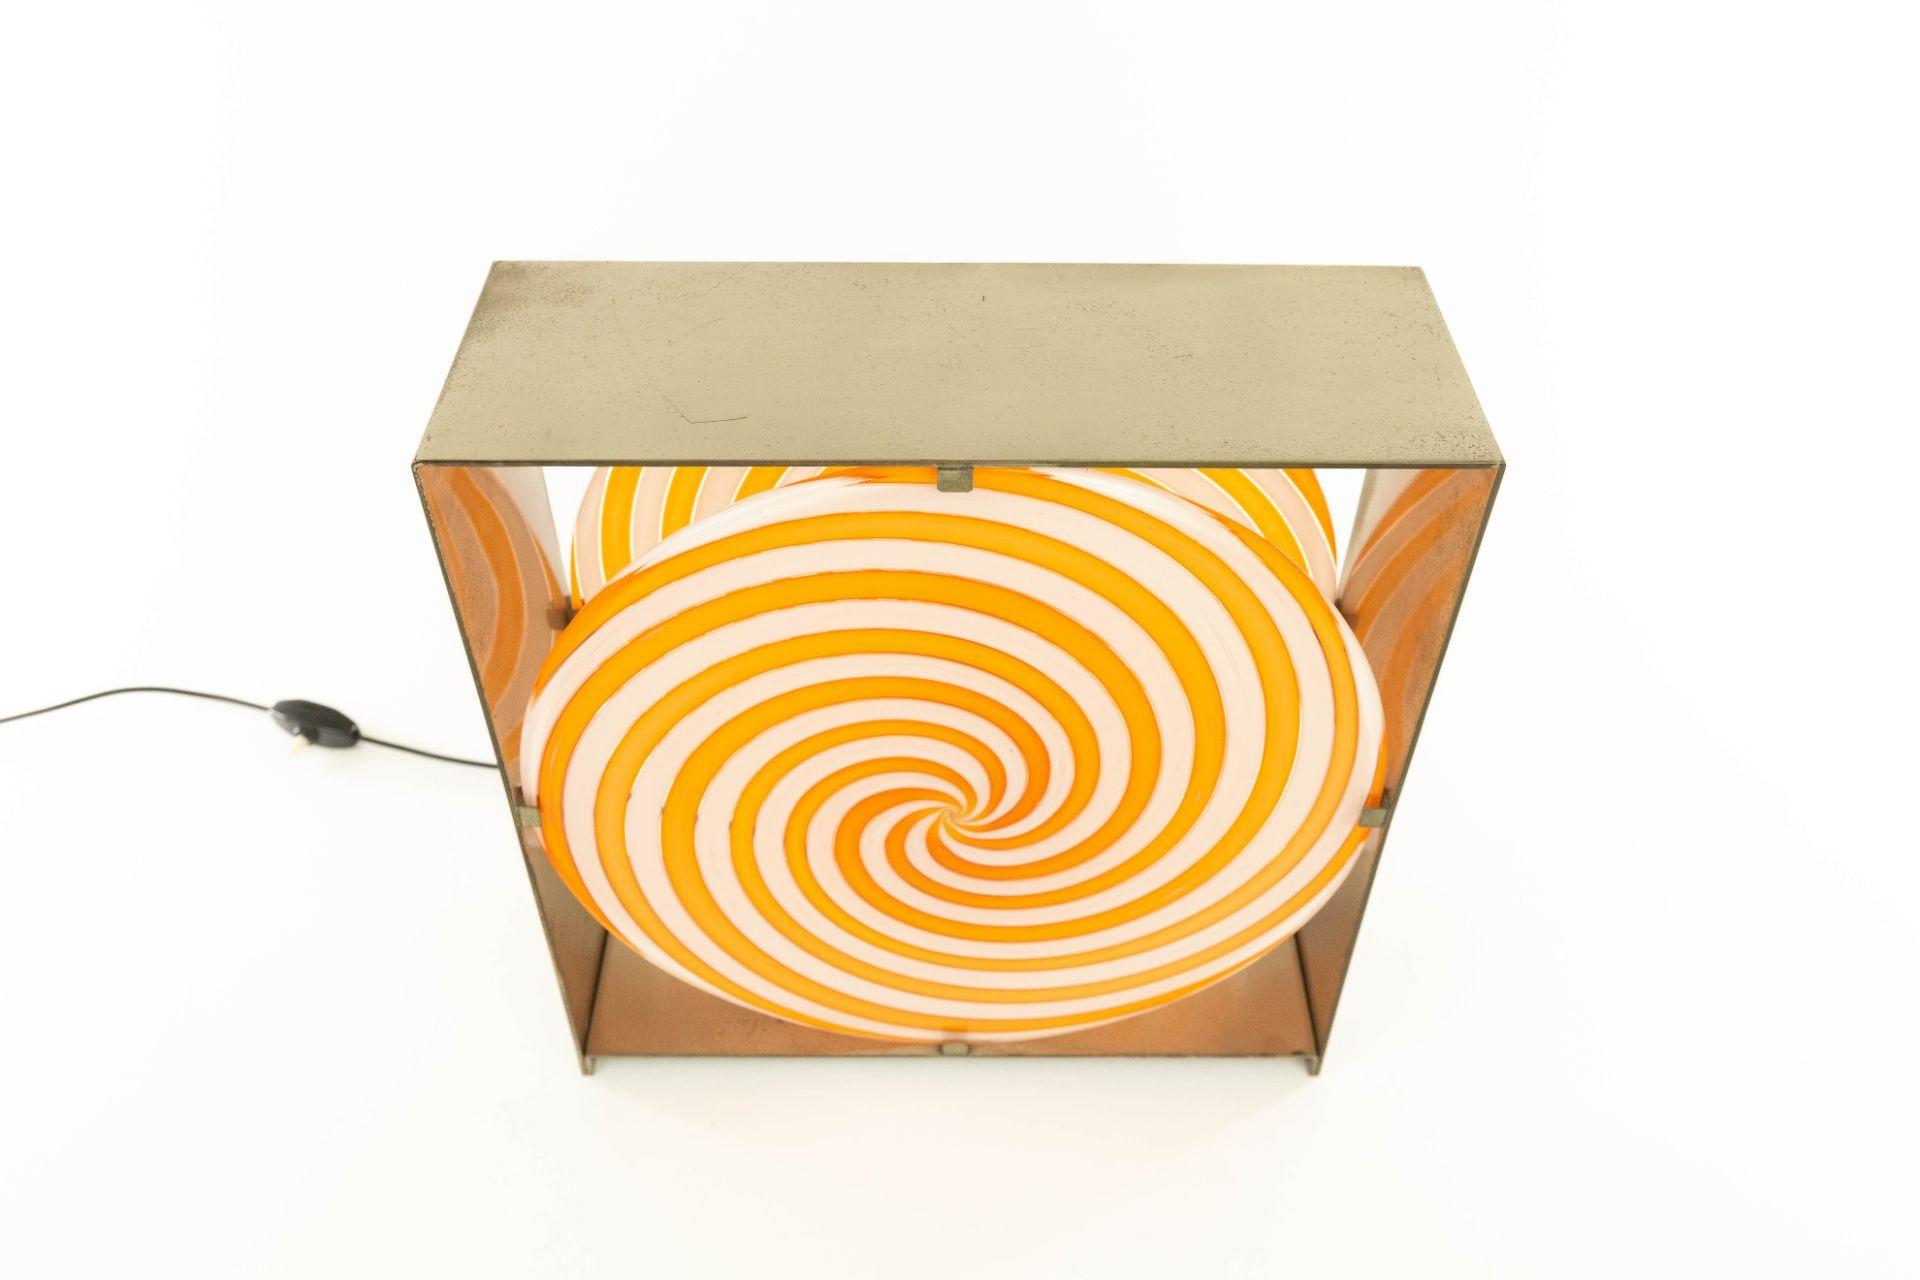 Orange spiral table lamp LT 217 in Murano glass by Carlo Nason for A.V. Mazzega